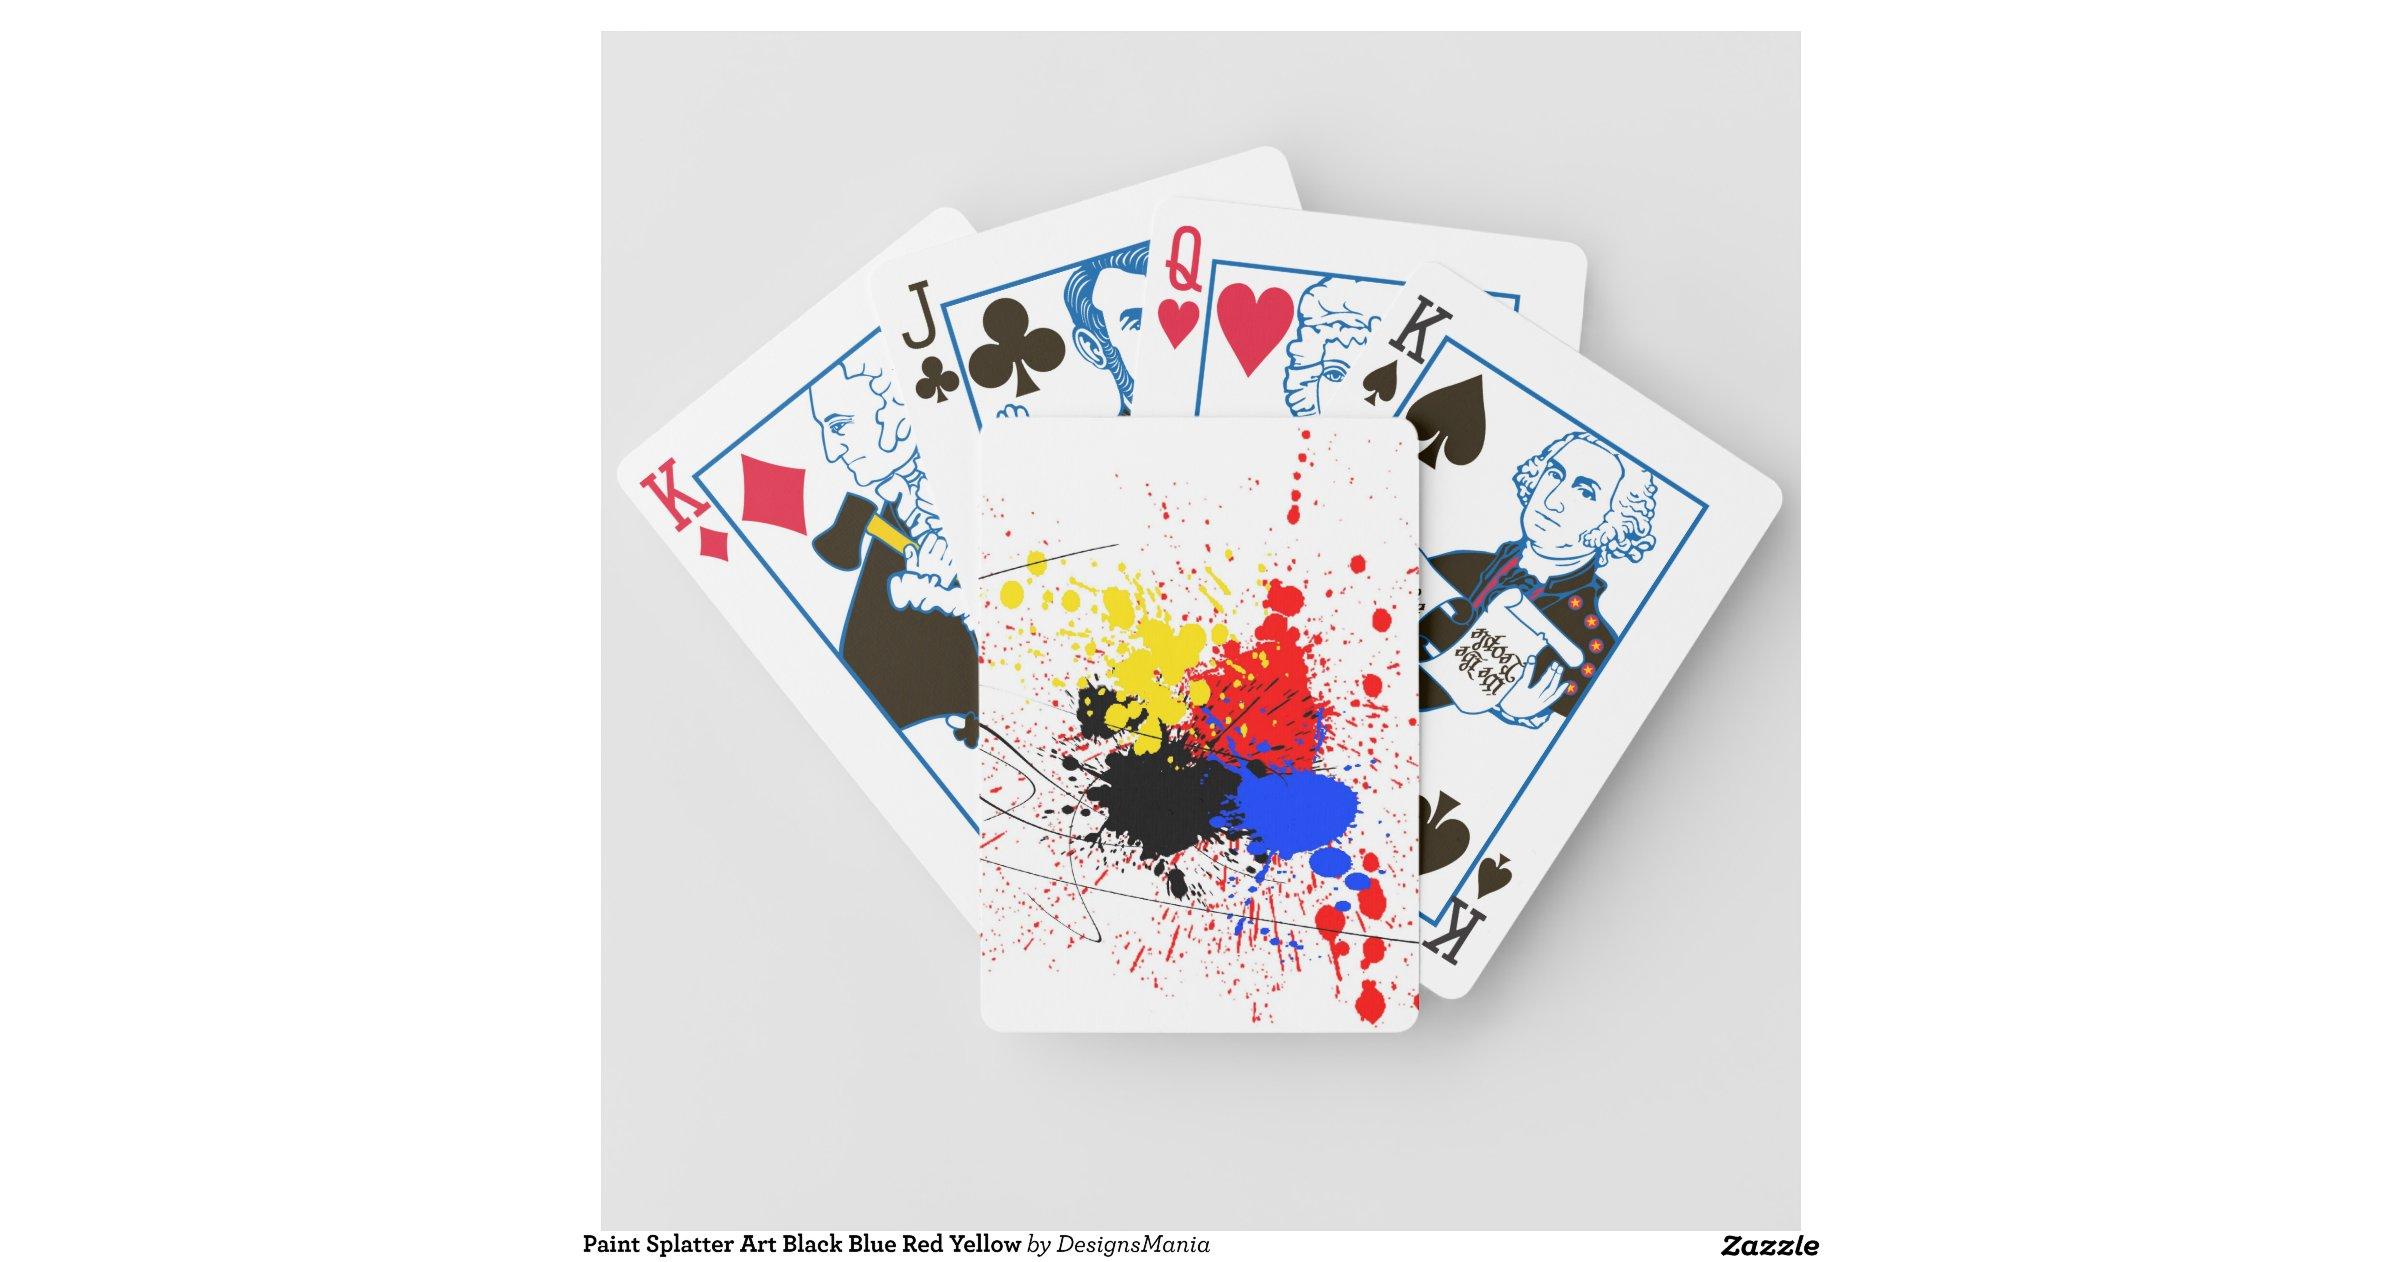 Black And Yellow Paint Splatter Paint Splatter Art Black Blue